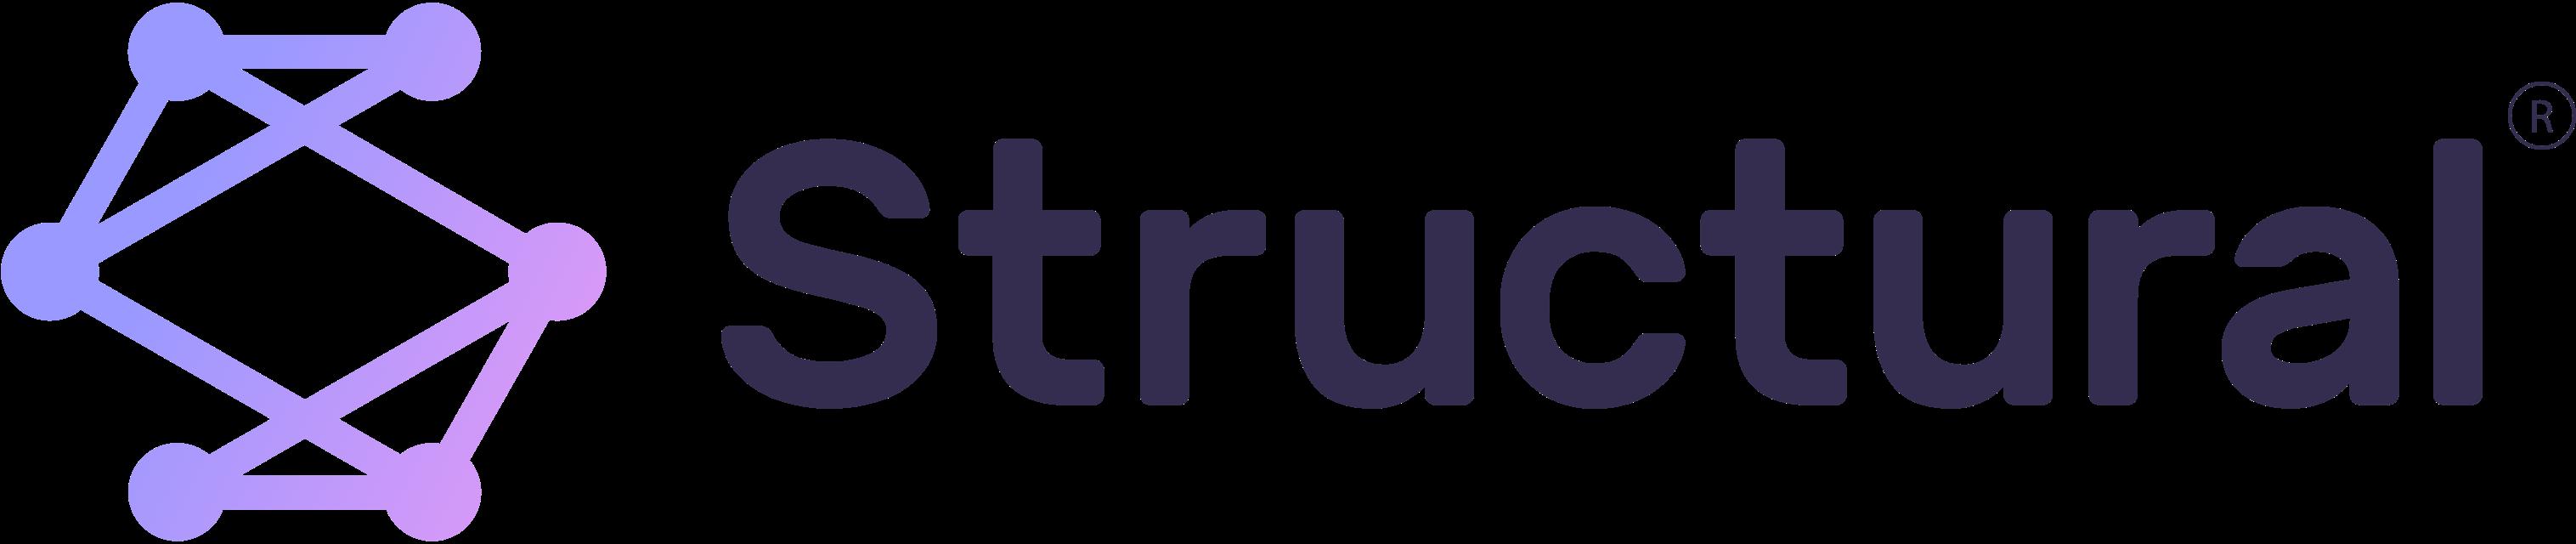 Logo-color-r.png